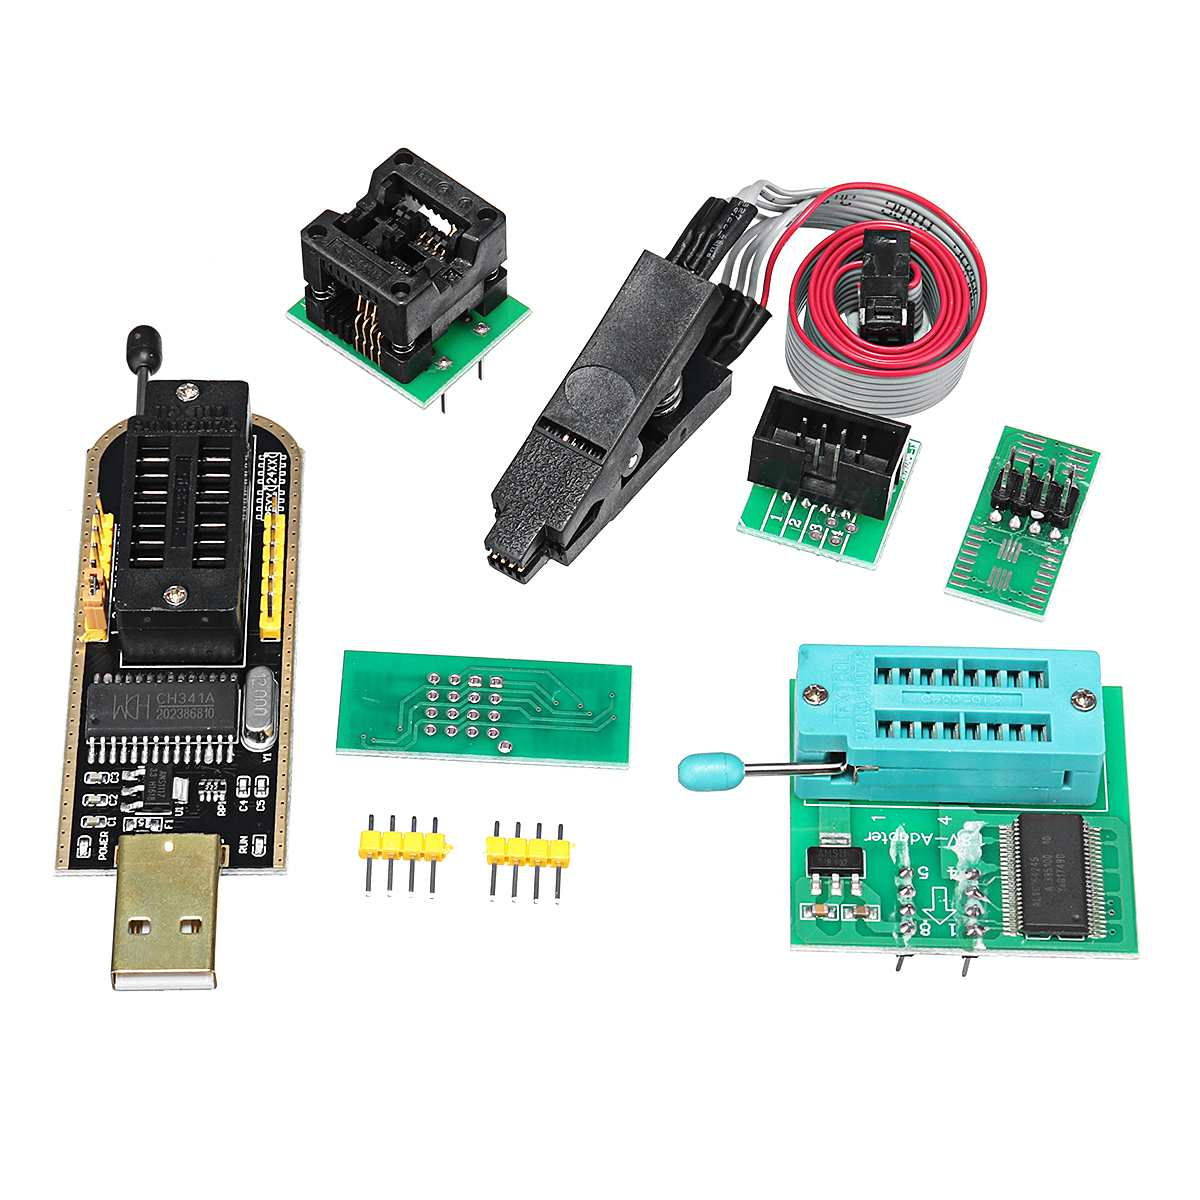 EEPROM Flash BIOS Programmatore USB Modulo CH341A + SOIC8 Clip di + 1.8 V Adattatore + SOIC8 AdattatoreEEPROM Flash BIOS Programmatore USB Modulo CH341A + SOIC8 Clip di + 1.8 V Adattatore + SOIC8 Adattatore